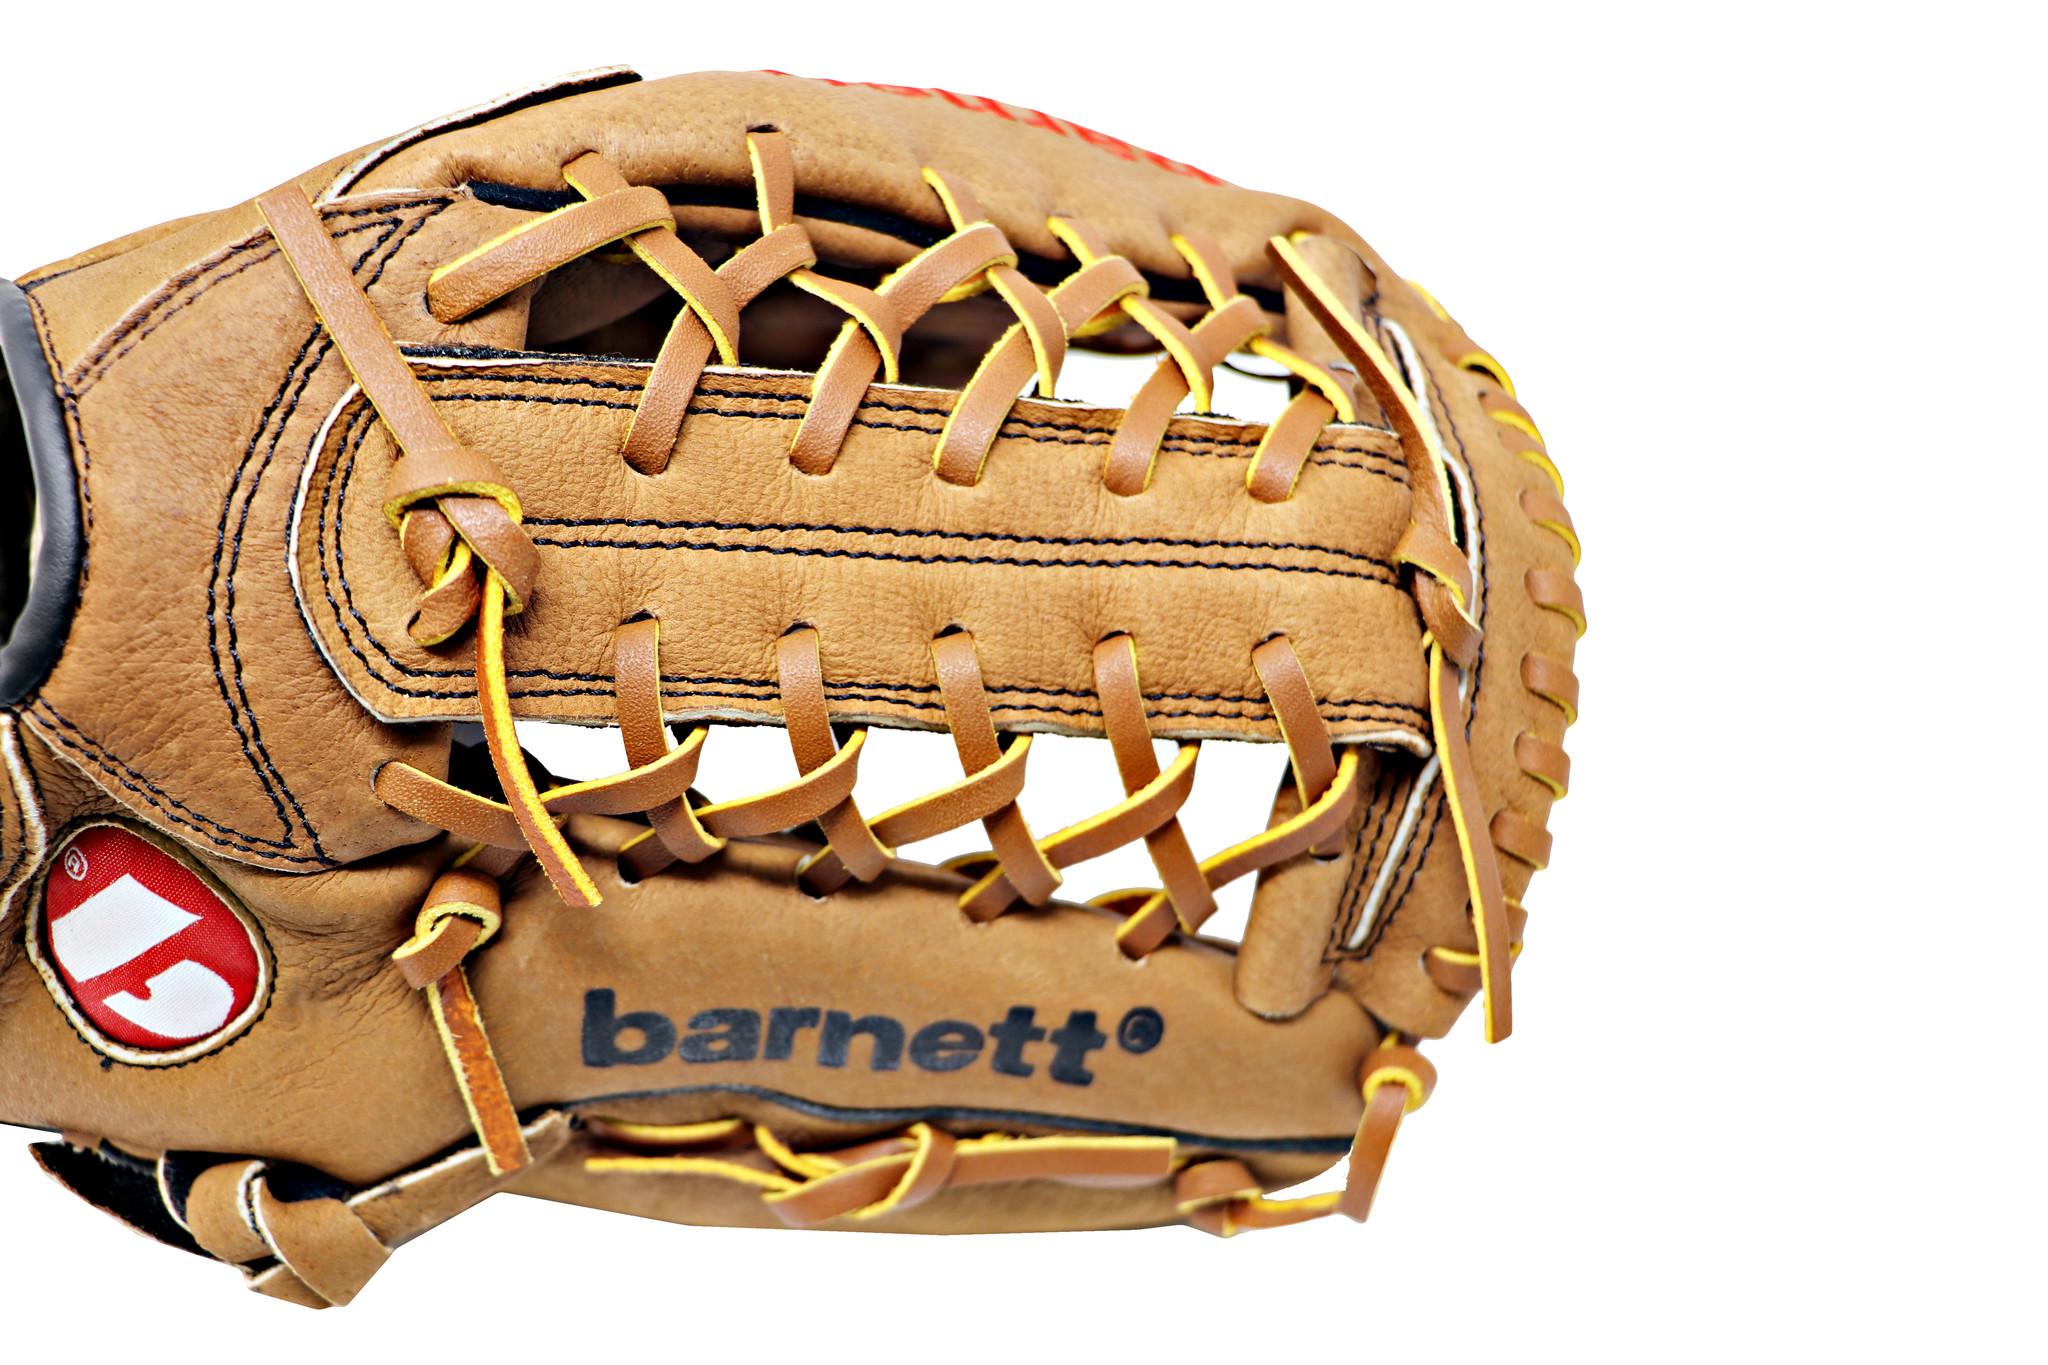 "barnett SL-125 Baseball Handschuh, Schweinsleder, Outfield, Größe 12,5"" (inch)"